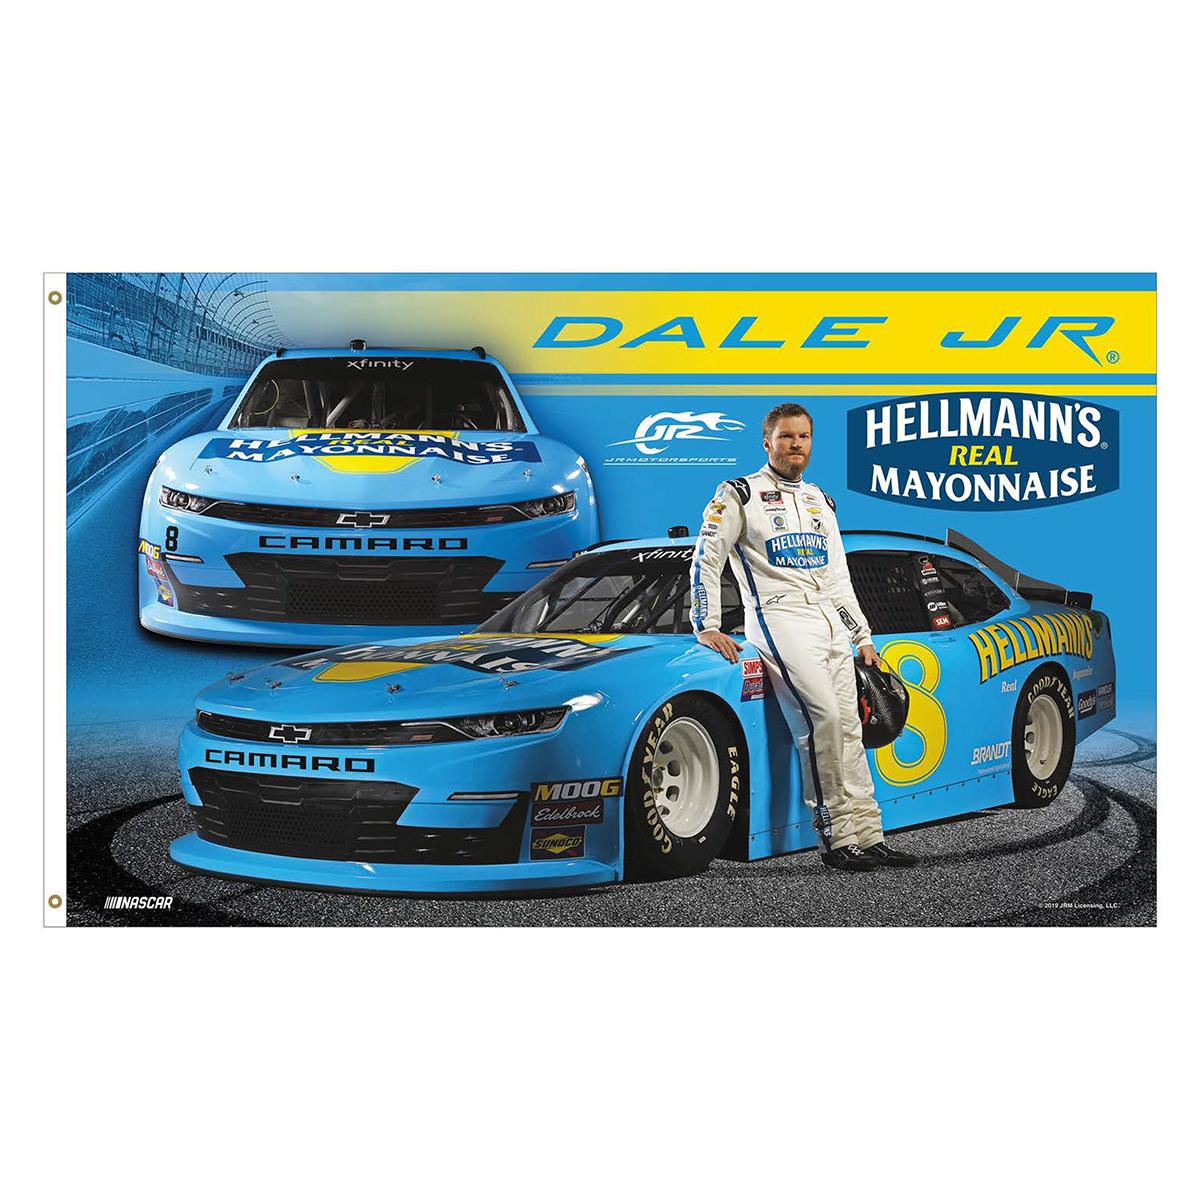 Dale Jr. # 8 Darlington 3x5 Deluxe Flag